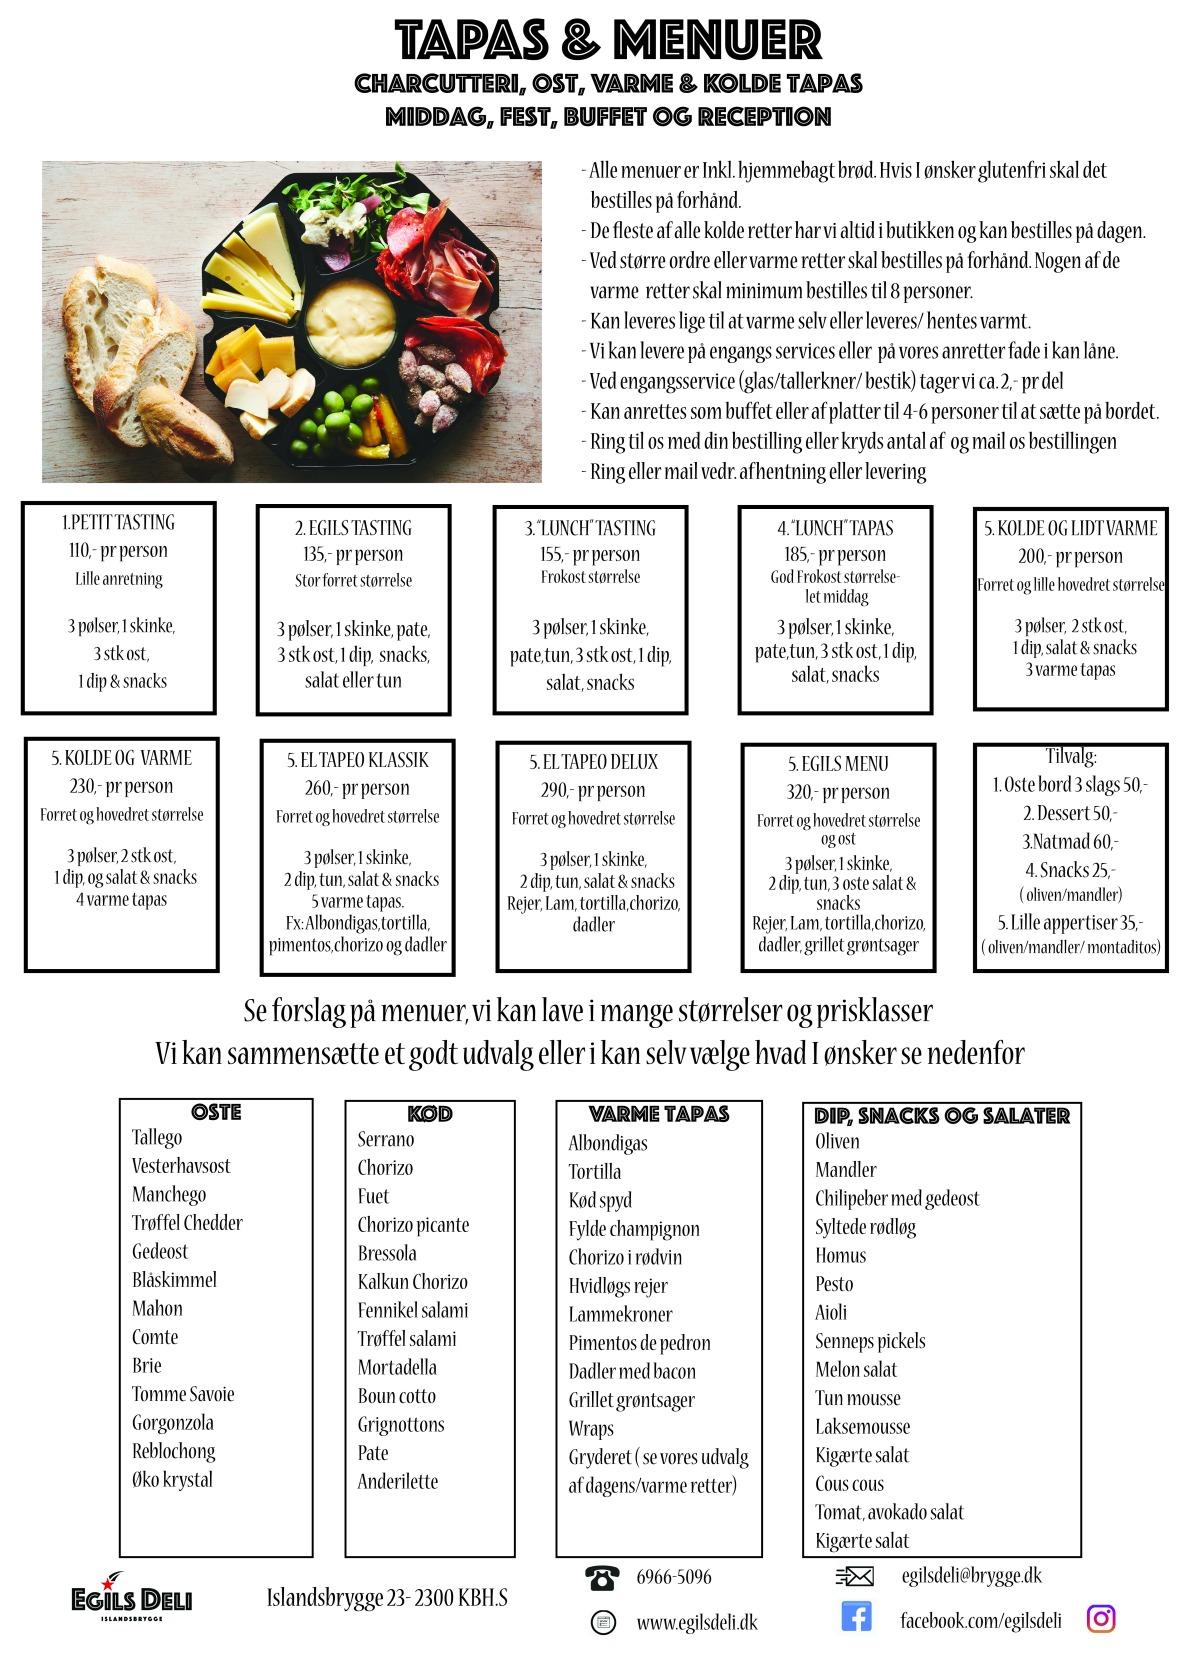 tapas og menuer